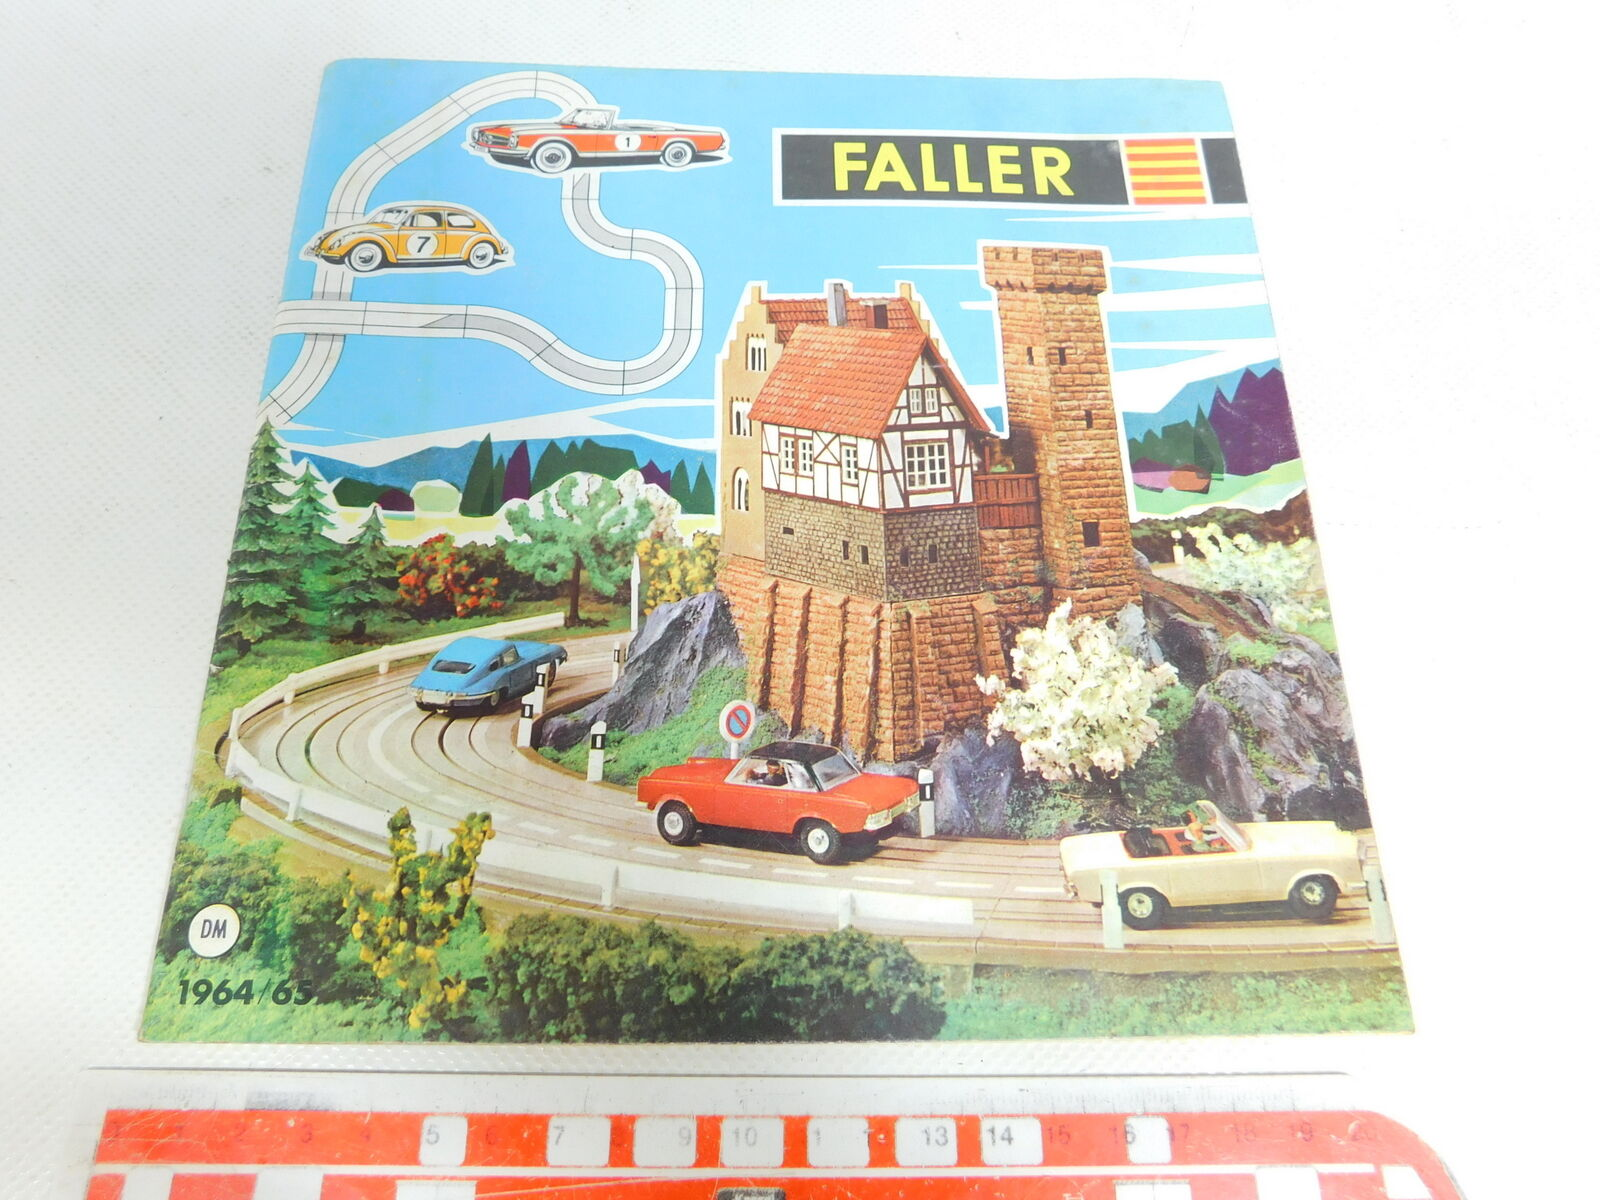 BX213-0, 5  Faller Catalogue   Year Dm 1964 65  Ams   Auto Motor Sport Etc.